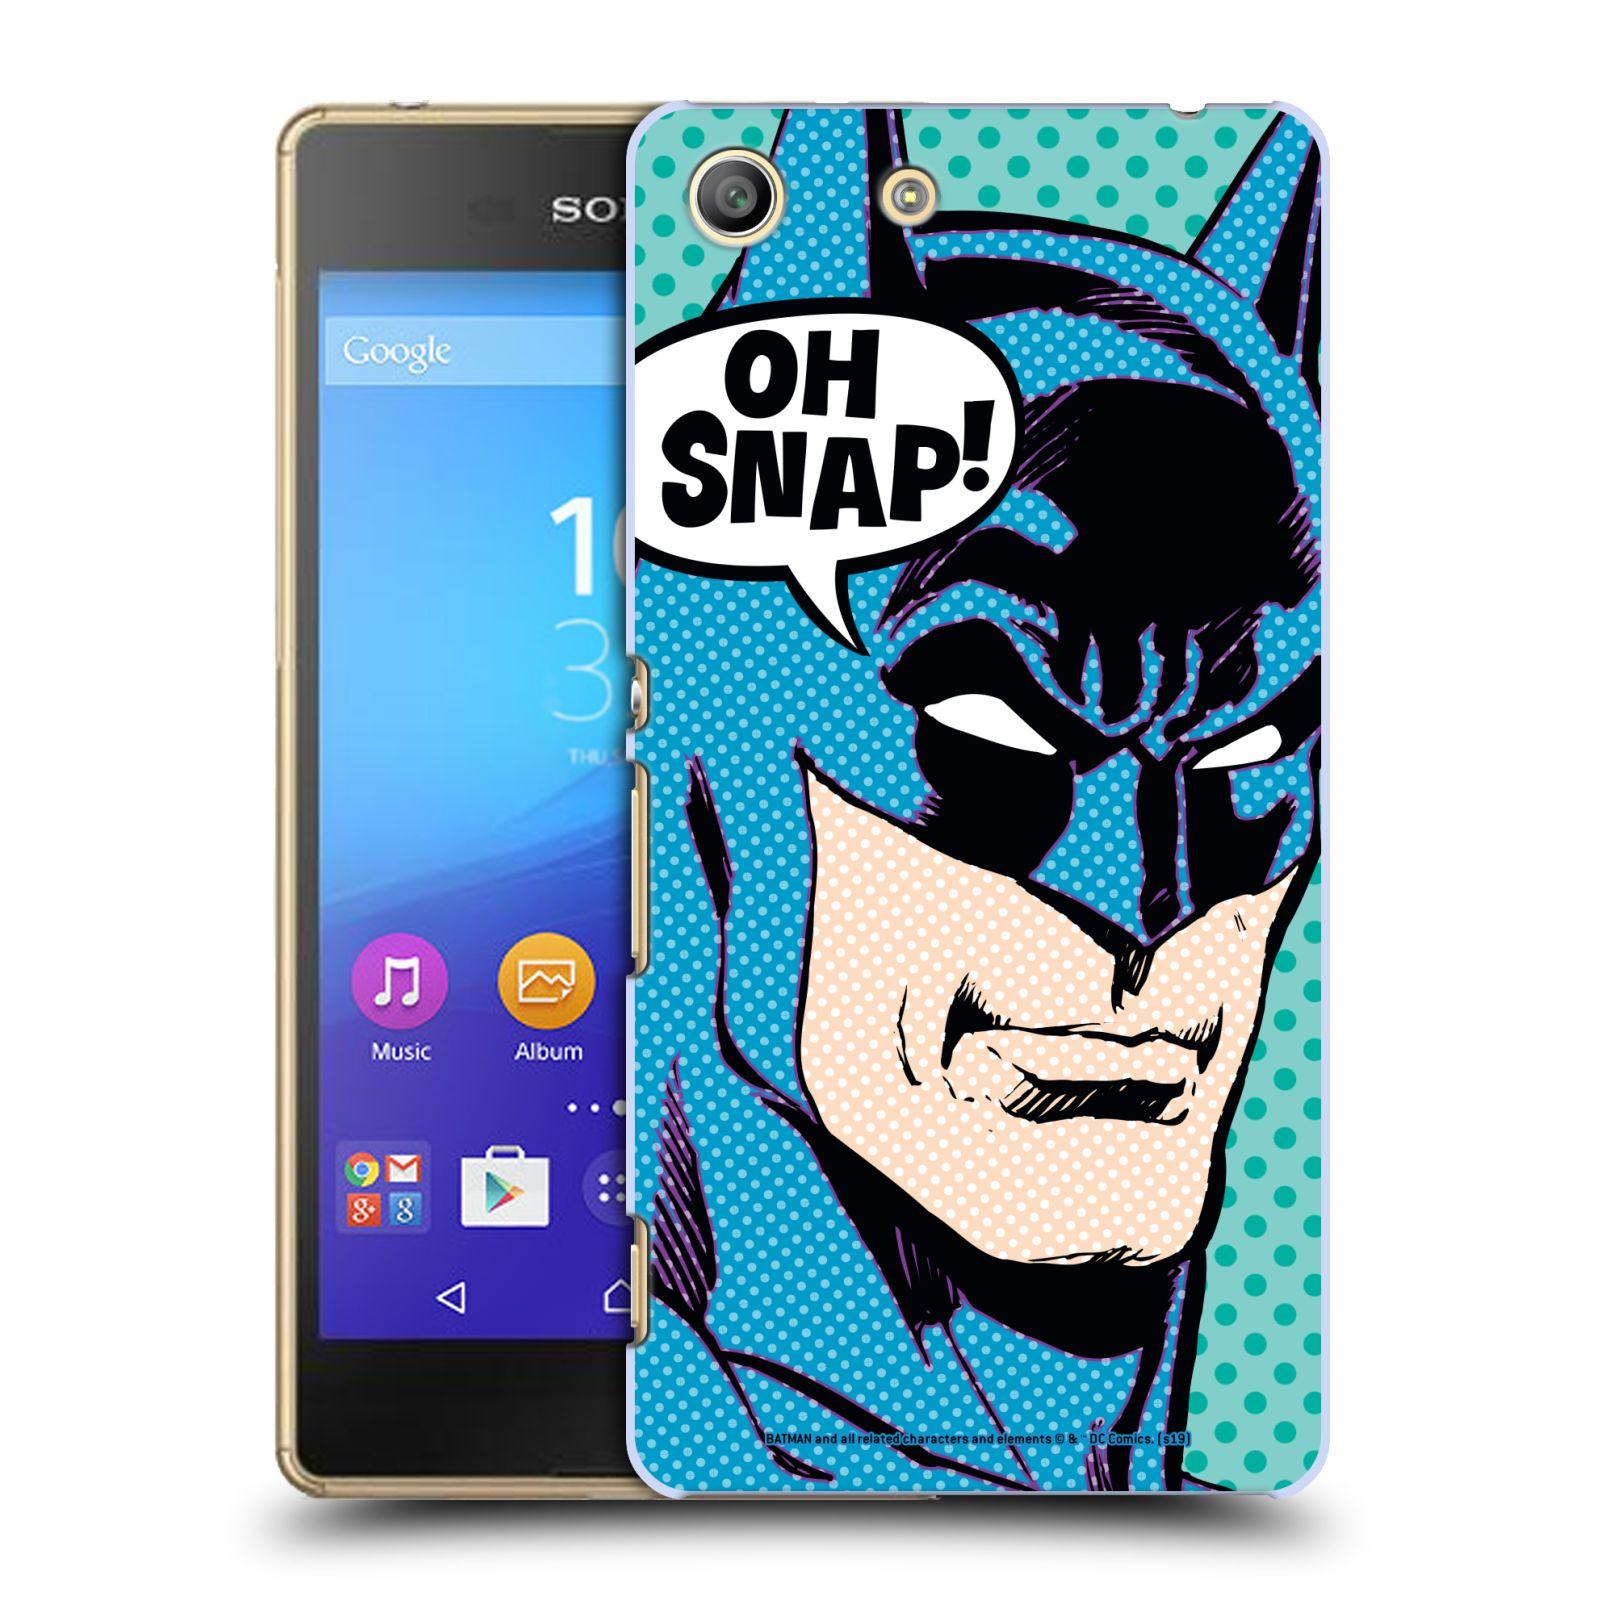 Pouzdro na mobil Sony Xperia M5 - HEAD CASE - DC komix Batman Pop Art tvář